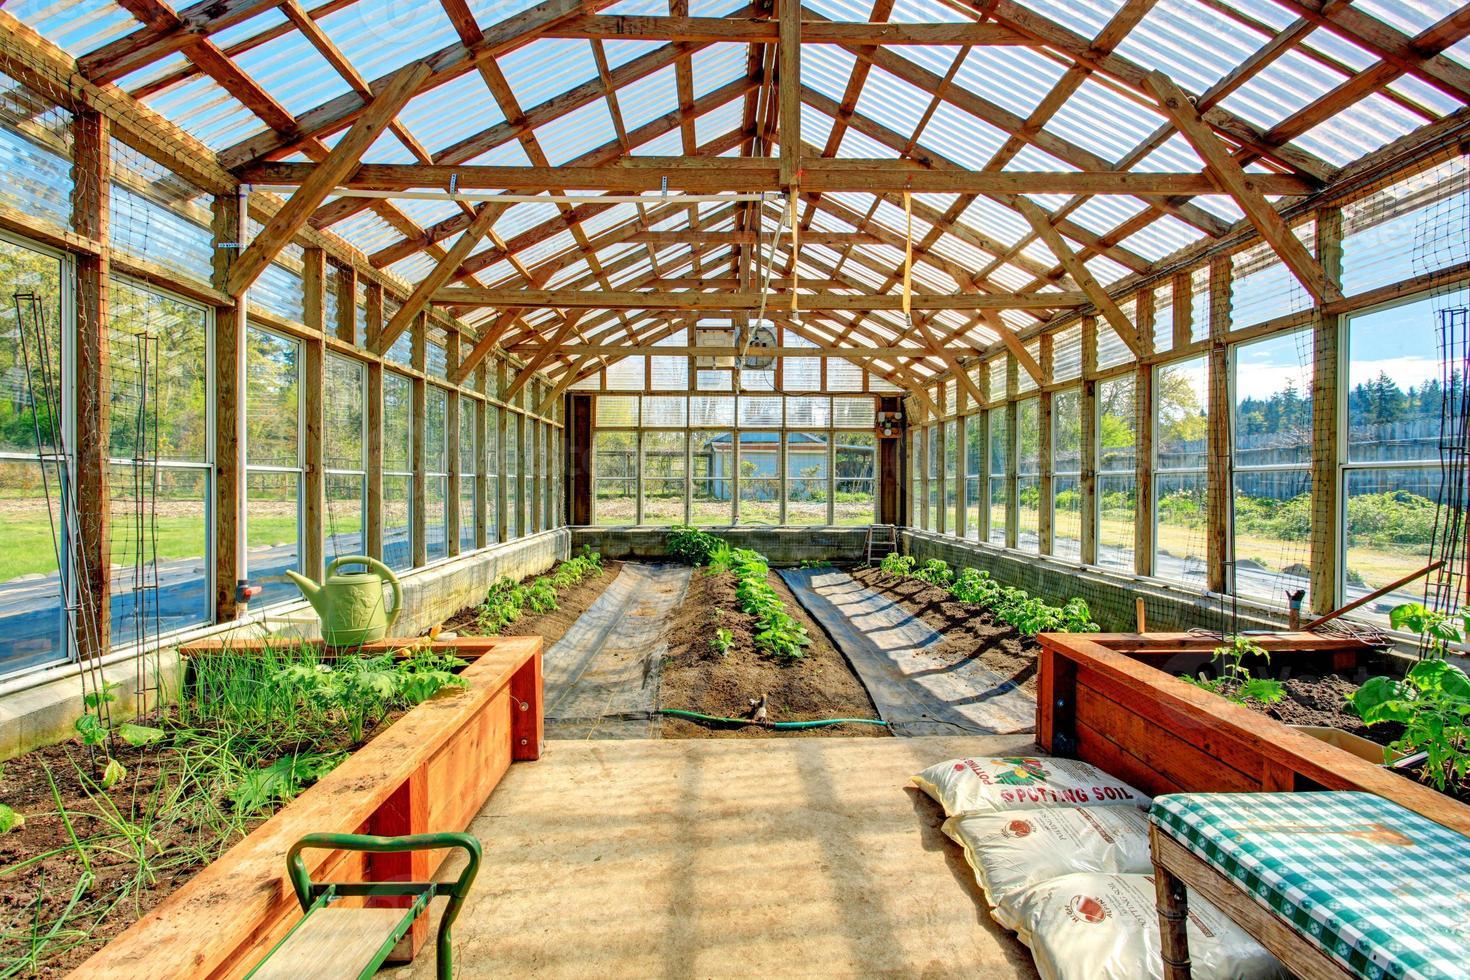 grande serra agricola foto